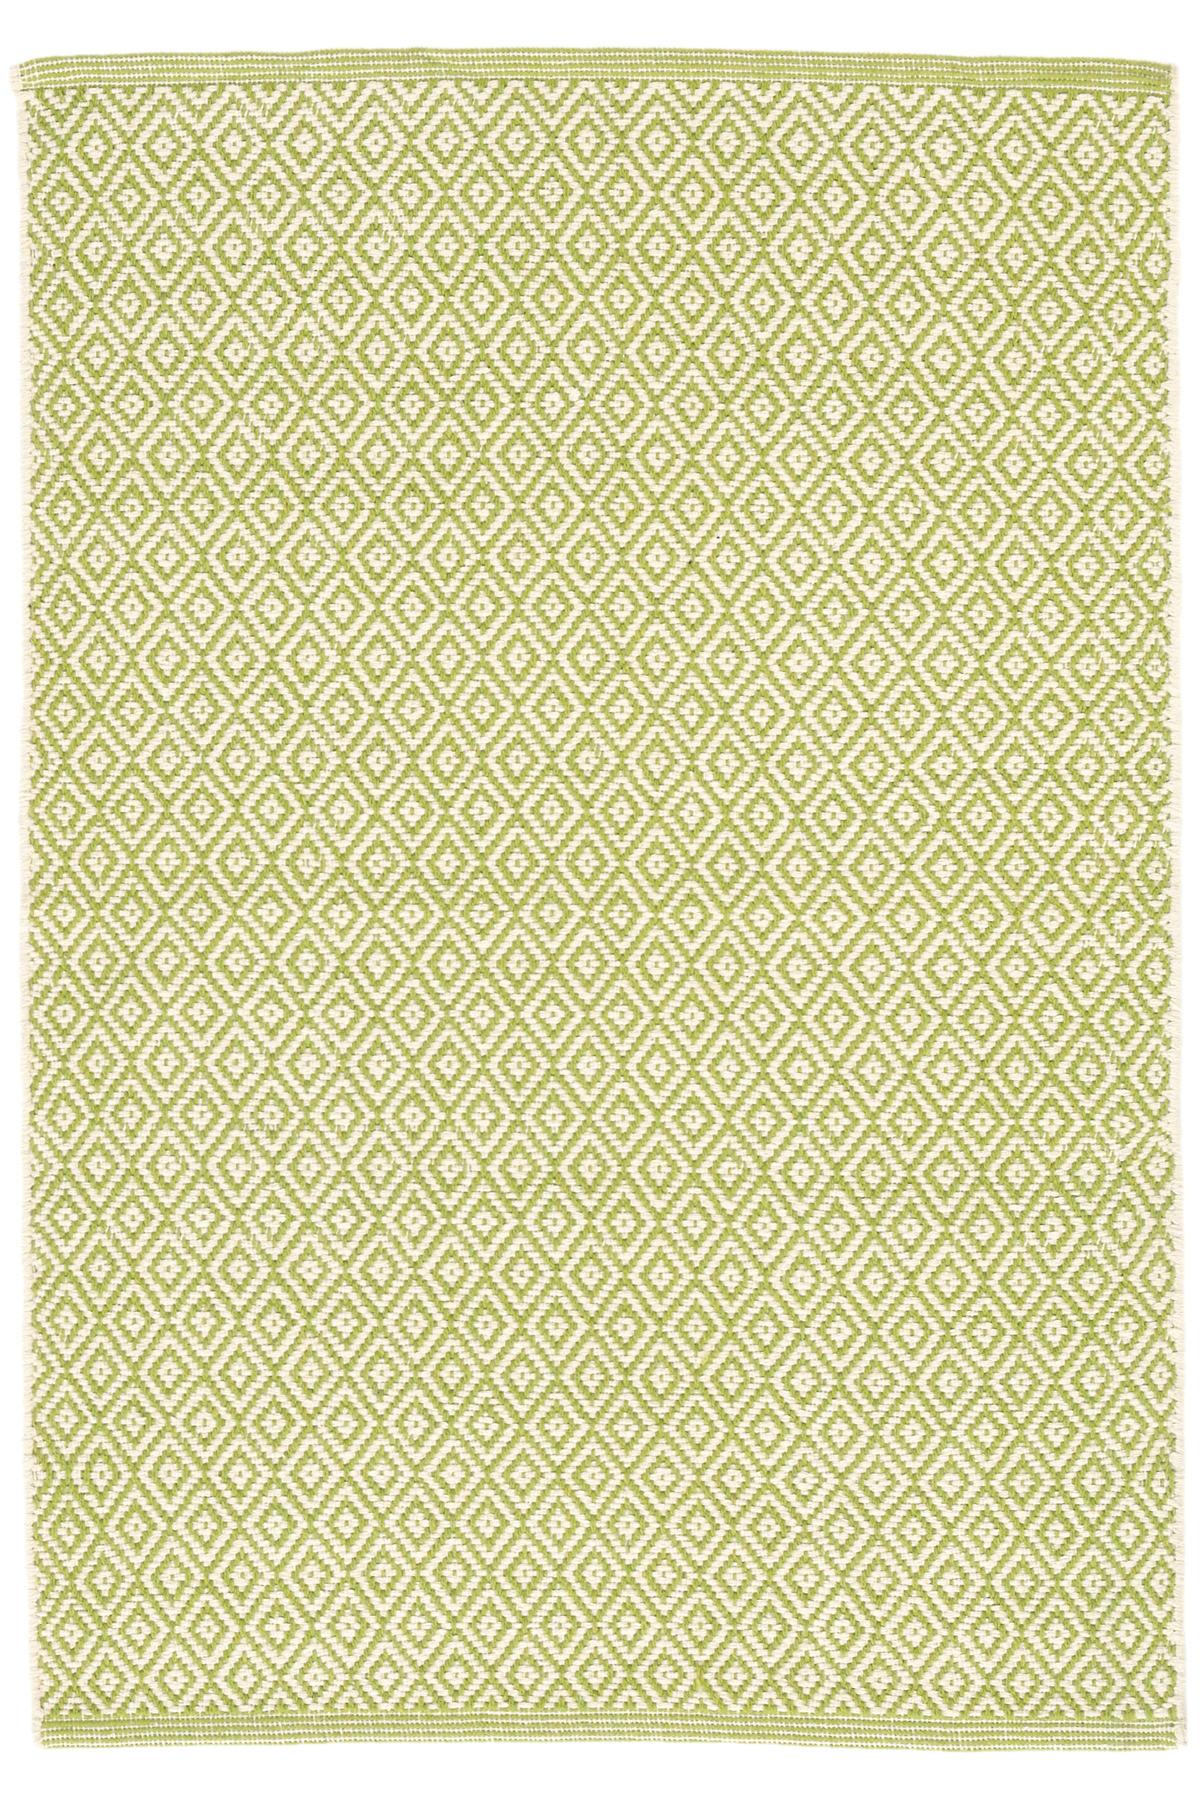 Lattice Citrus Woven Cotton Rug